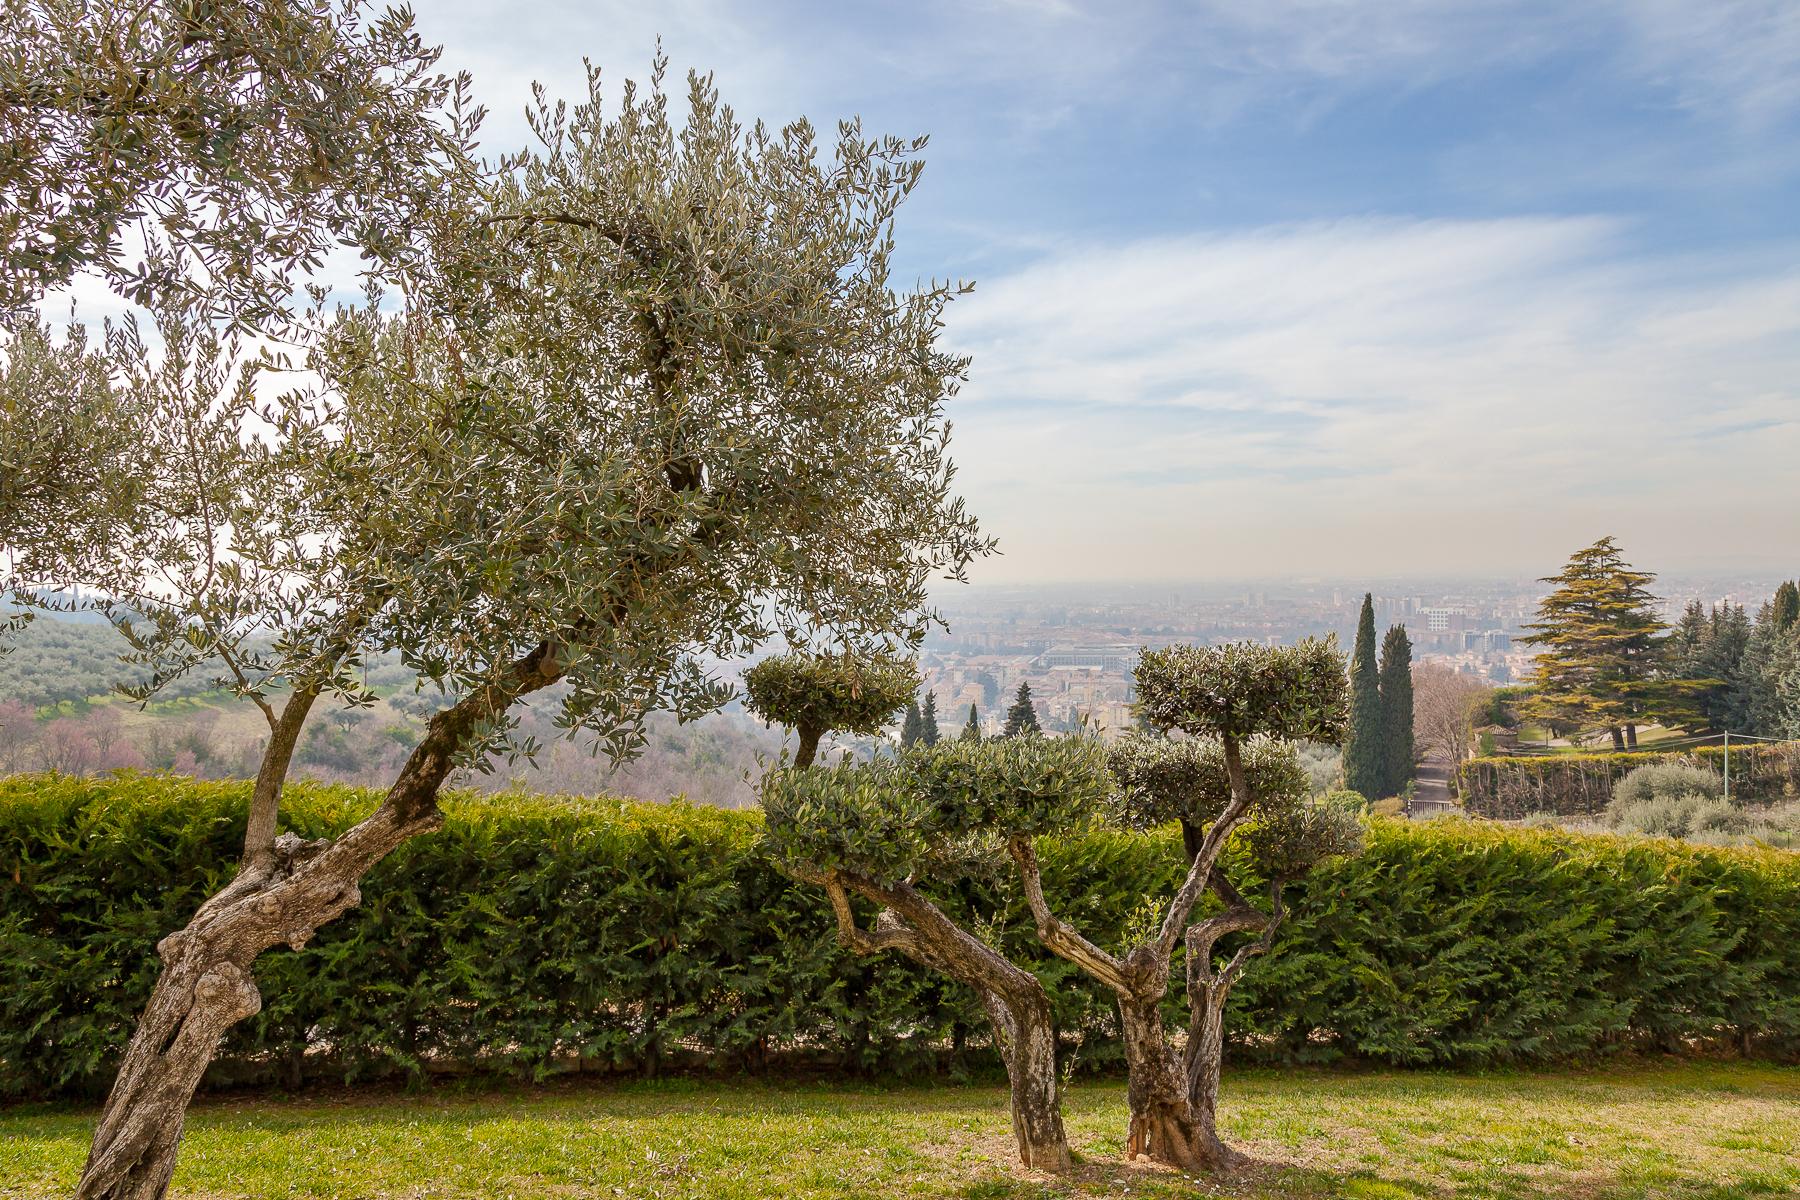 Villa in Vendita a Verona: 5 locali, 630 mq - Foto 15